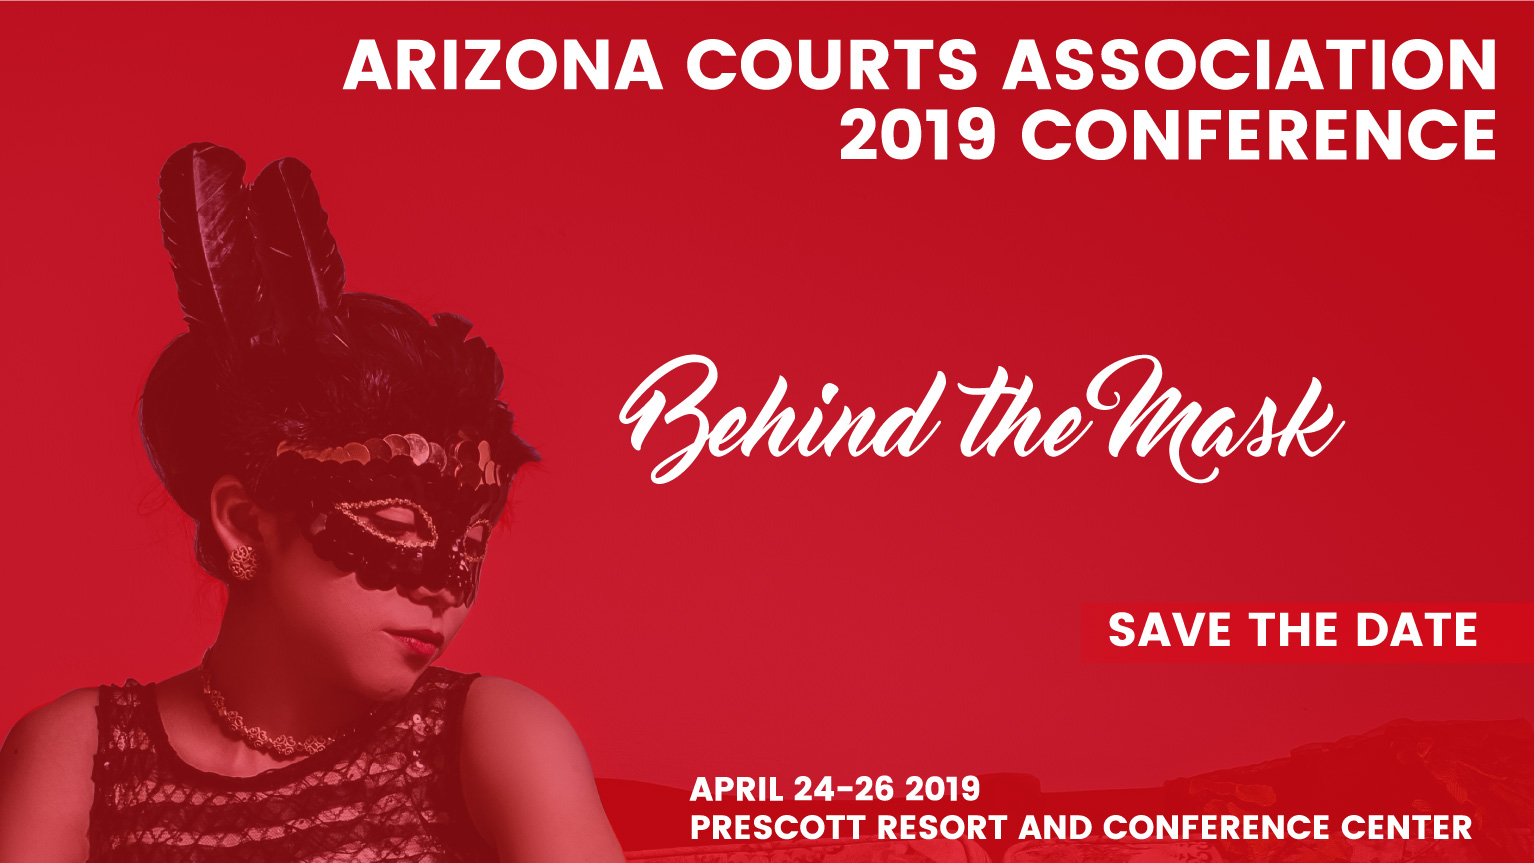 Arizona Courts Association 2019 Conference